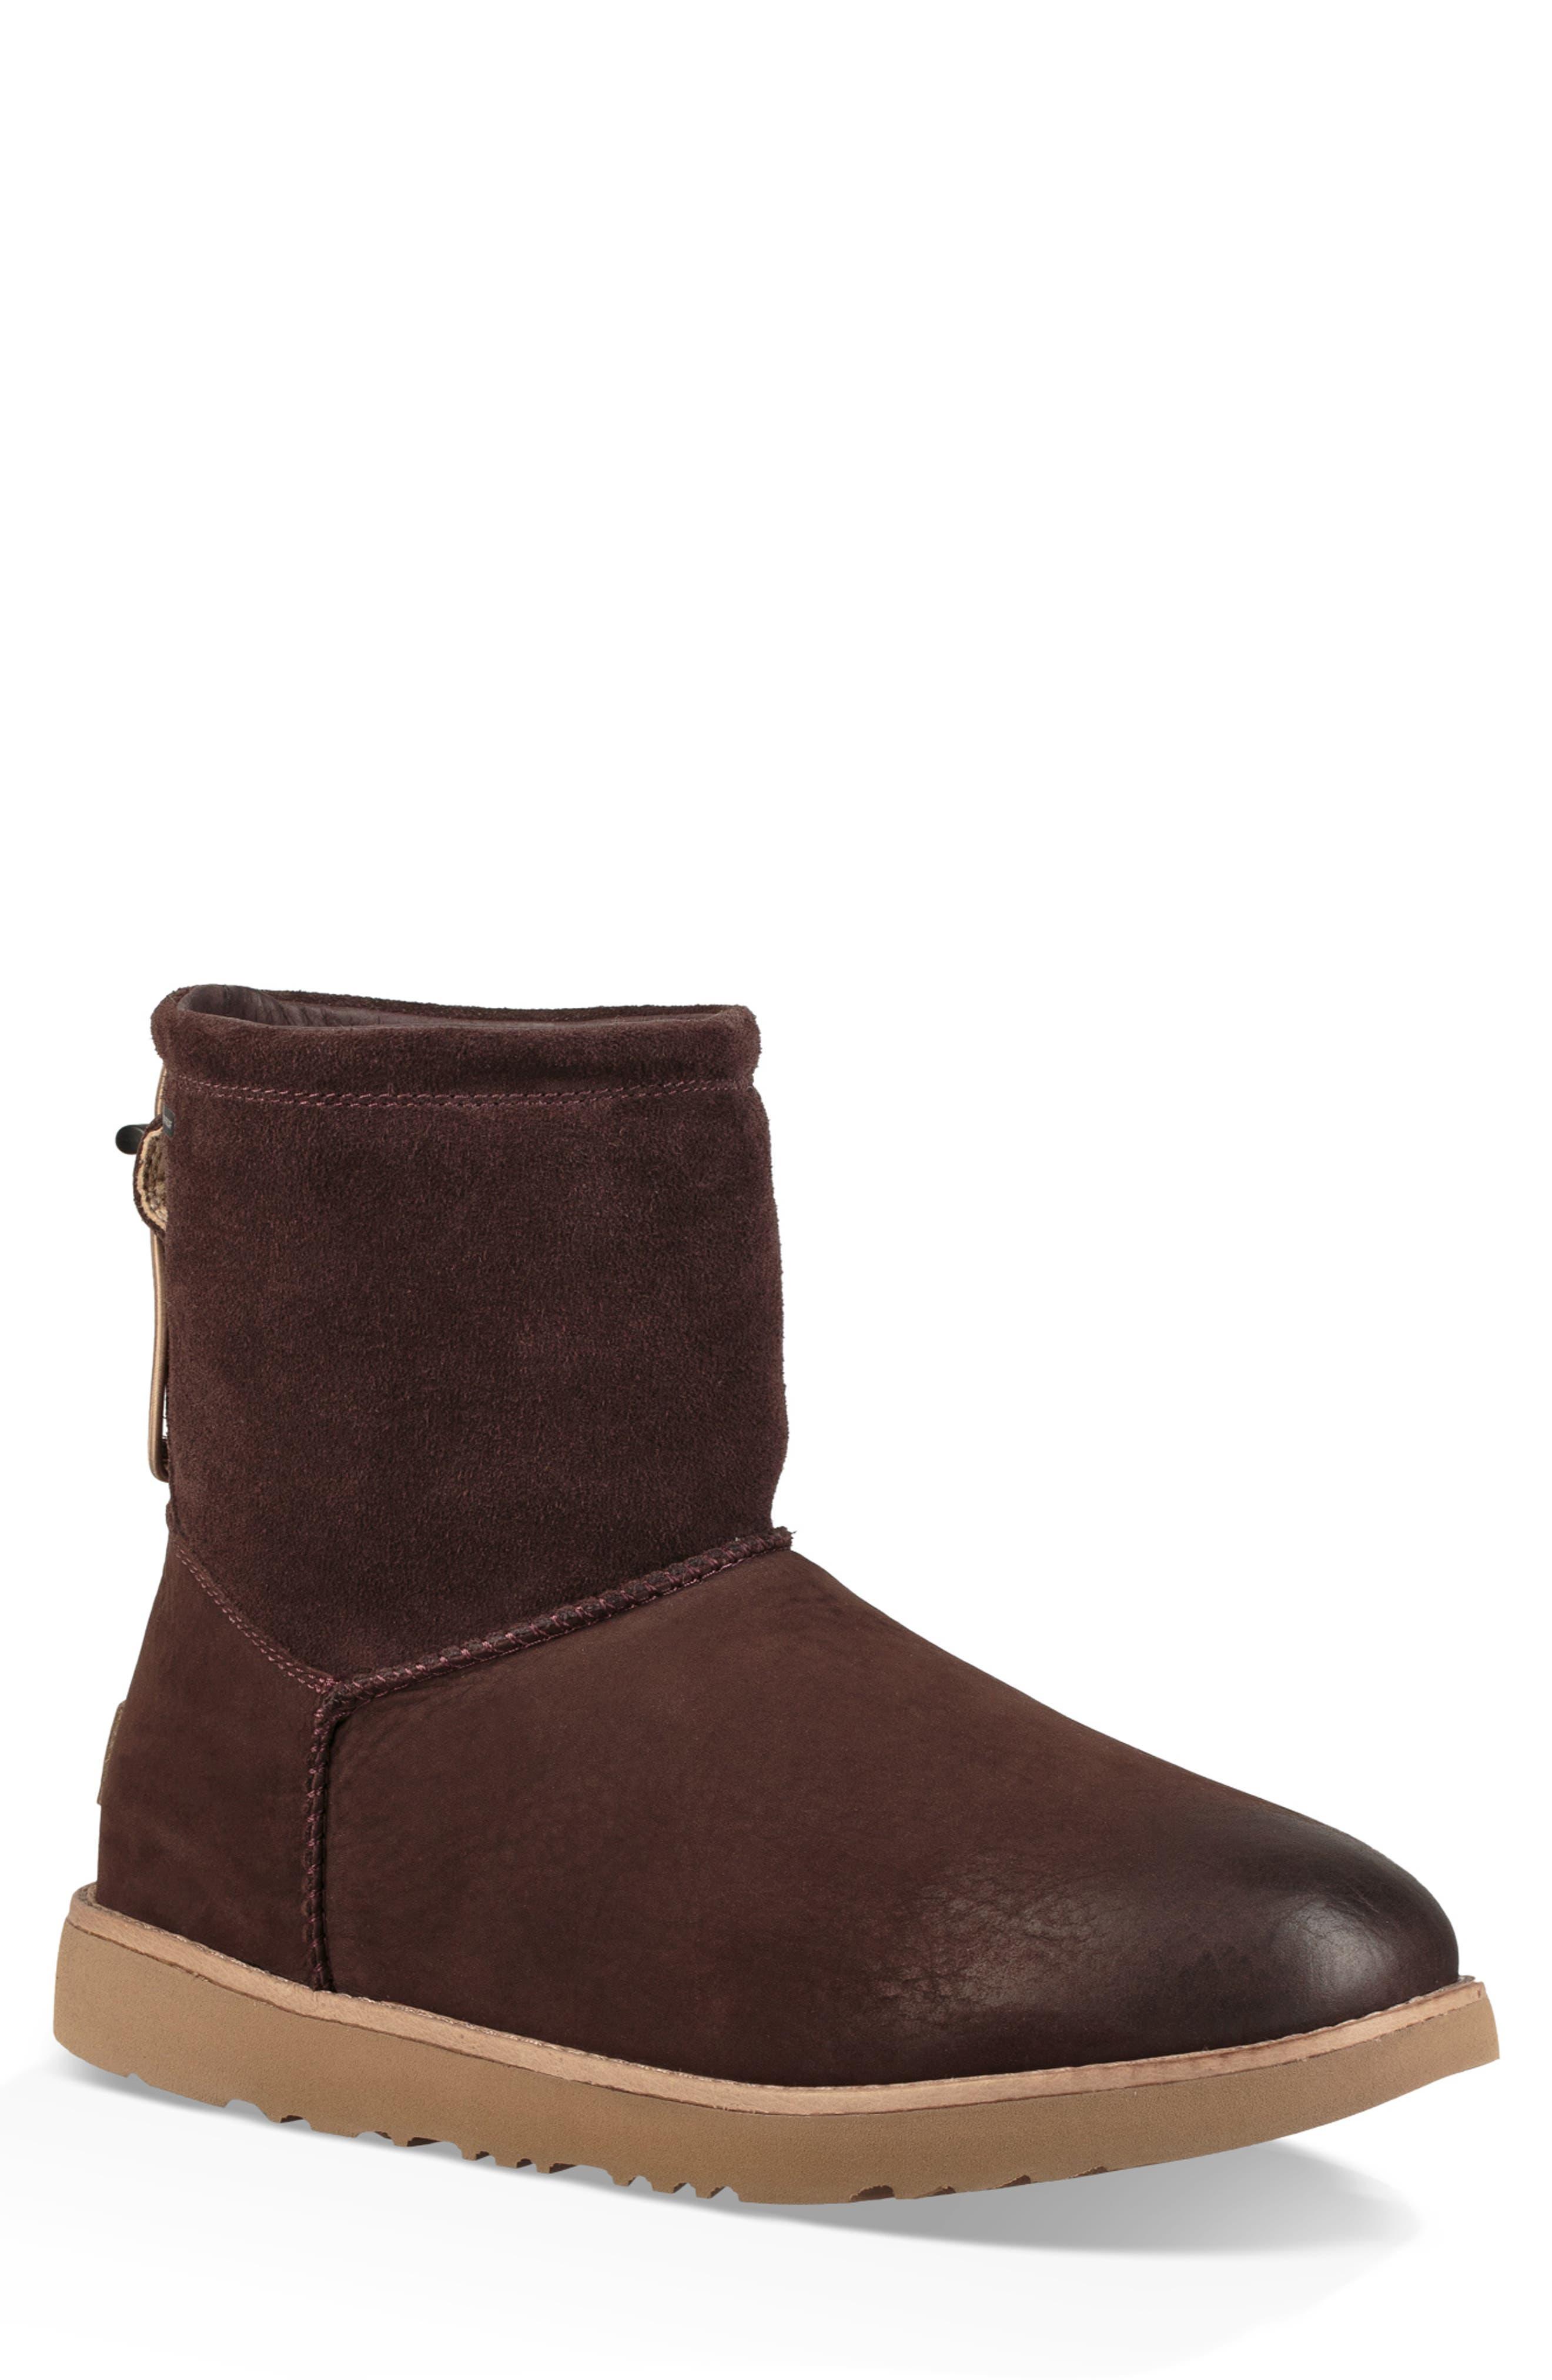 Ugg Classic Waterproof Boot, Brown